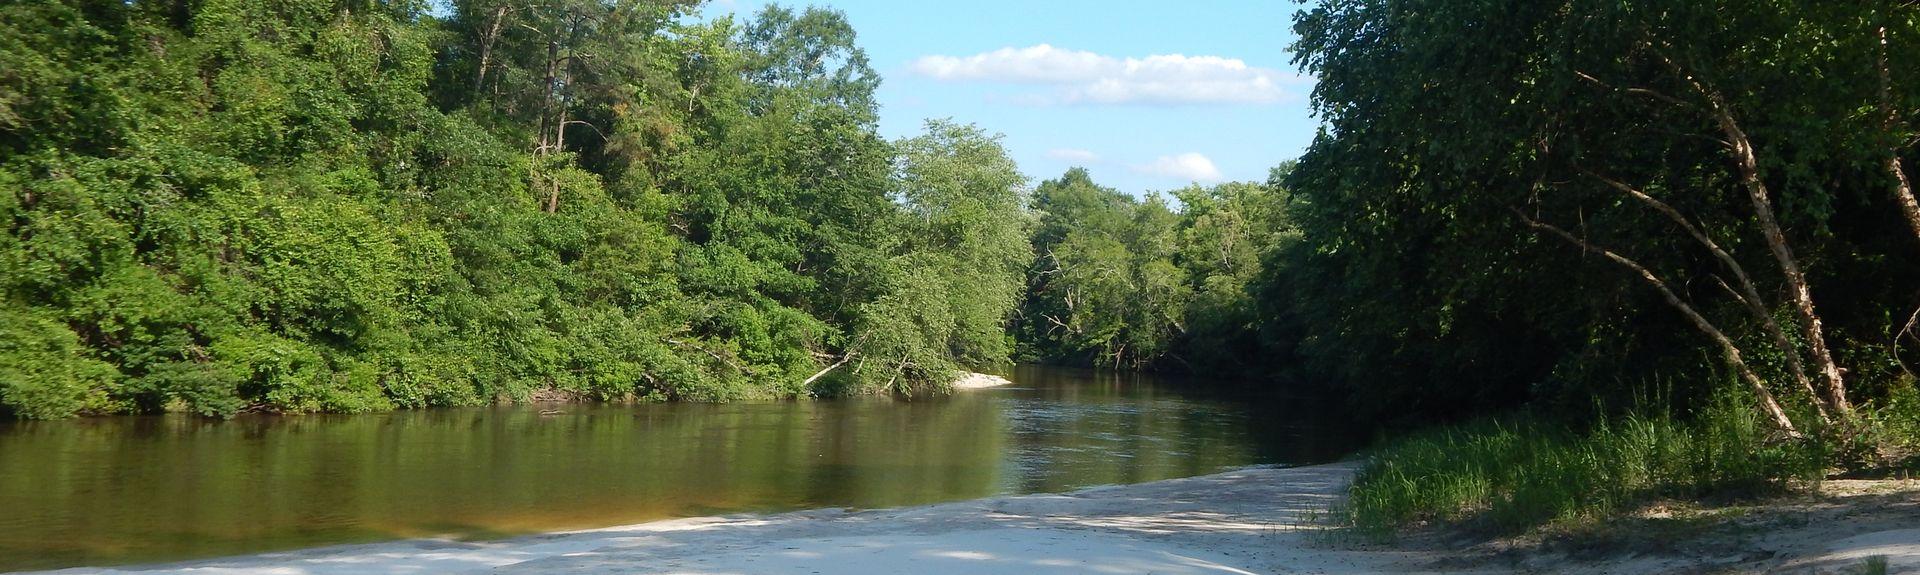 Perkinston, Mississippi, United States of America